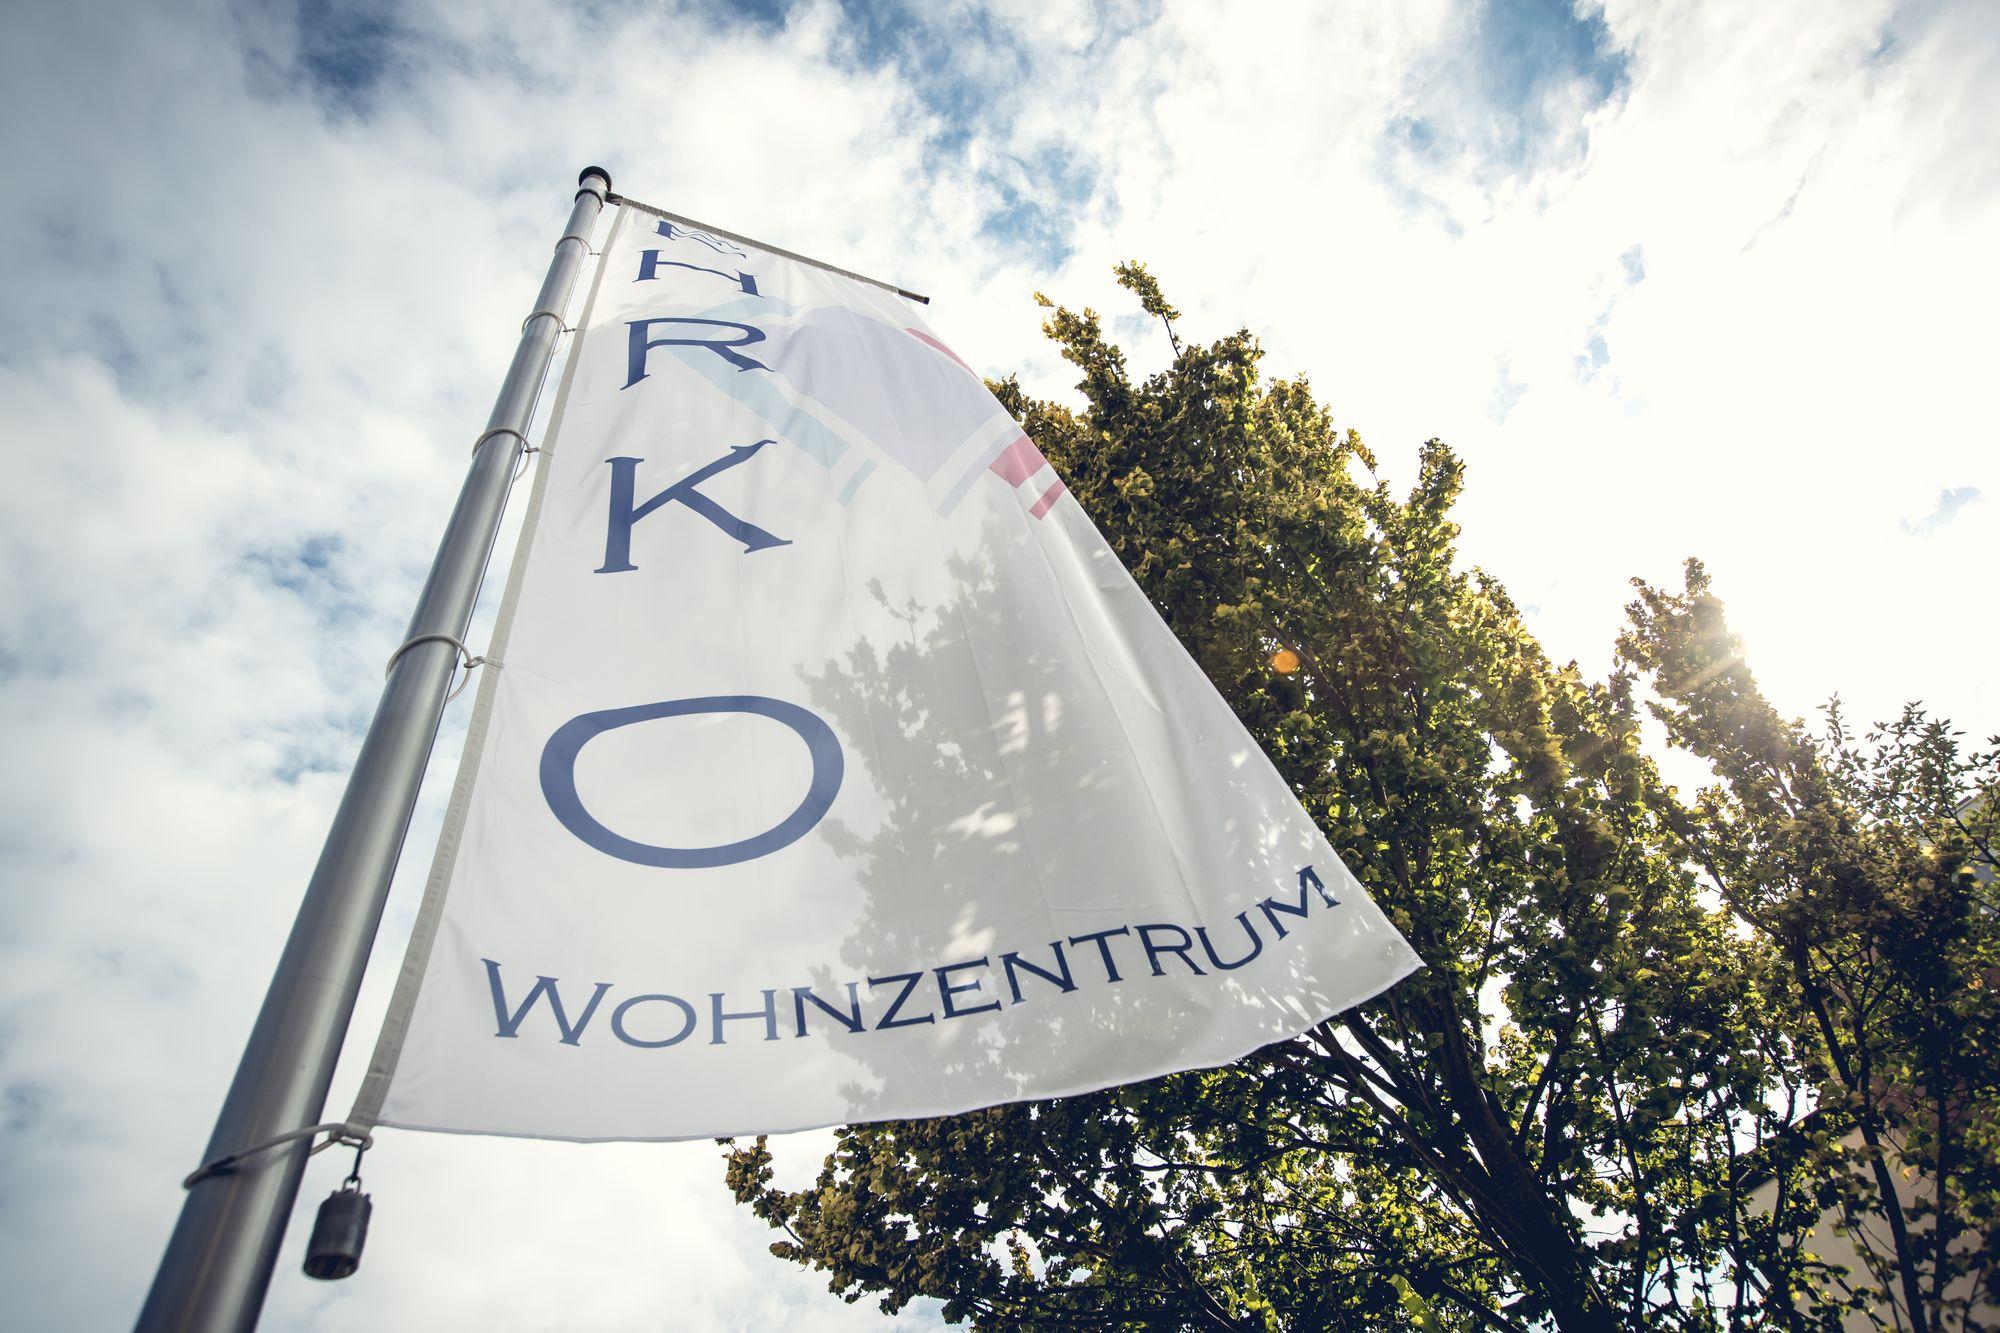 ehrko-wohnzentrum_az1i6116.jpg